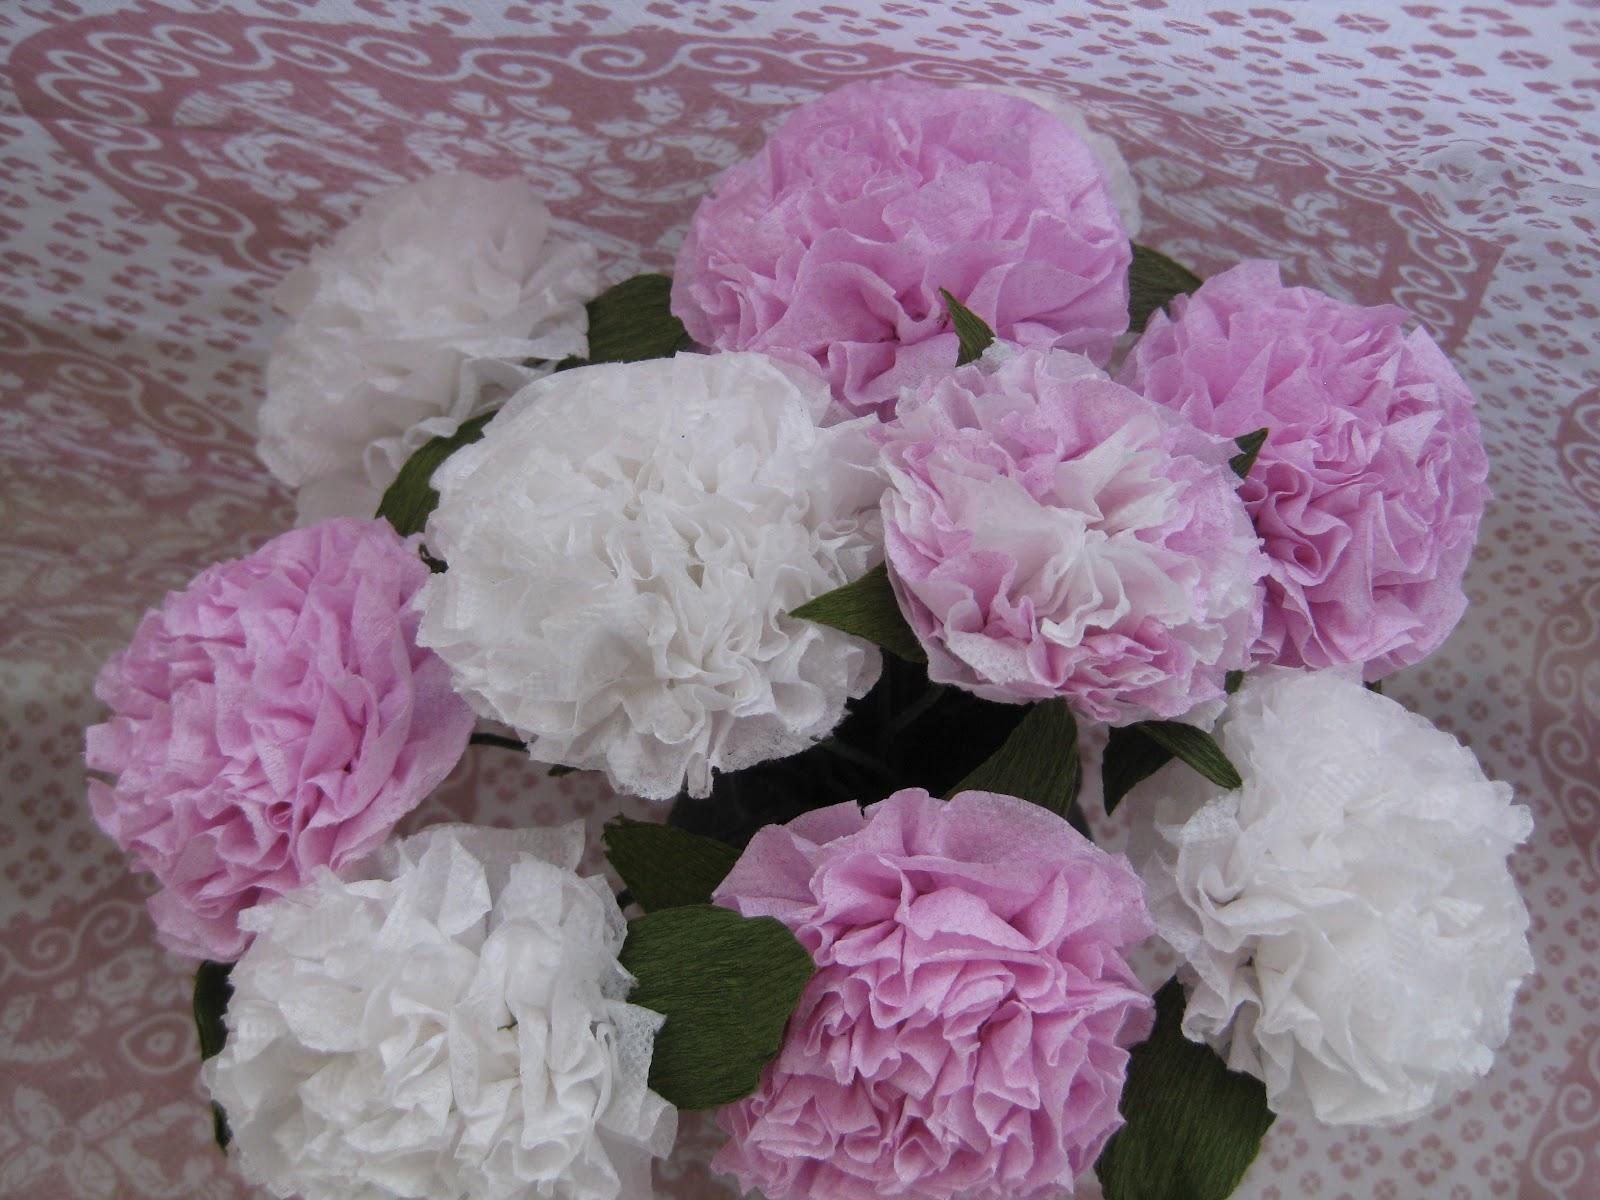 Himaja S Crafts Tisssue Paper Paper Flower2